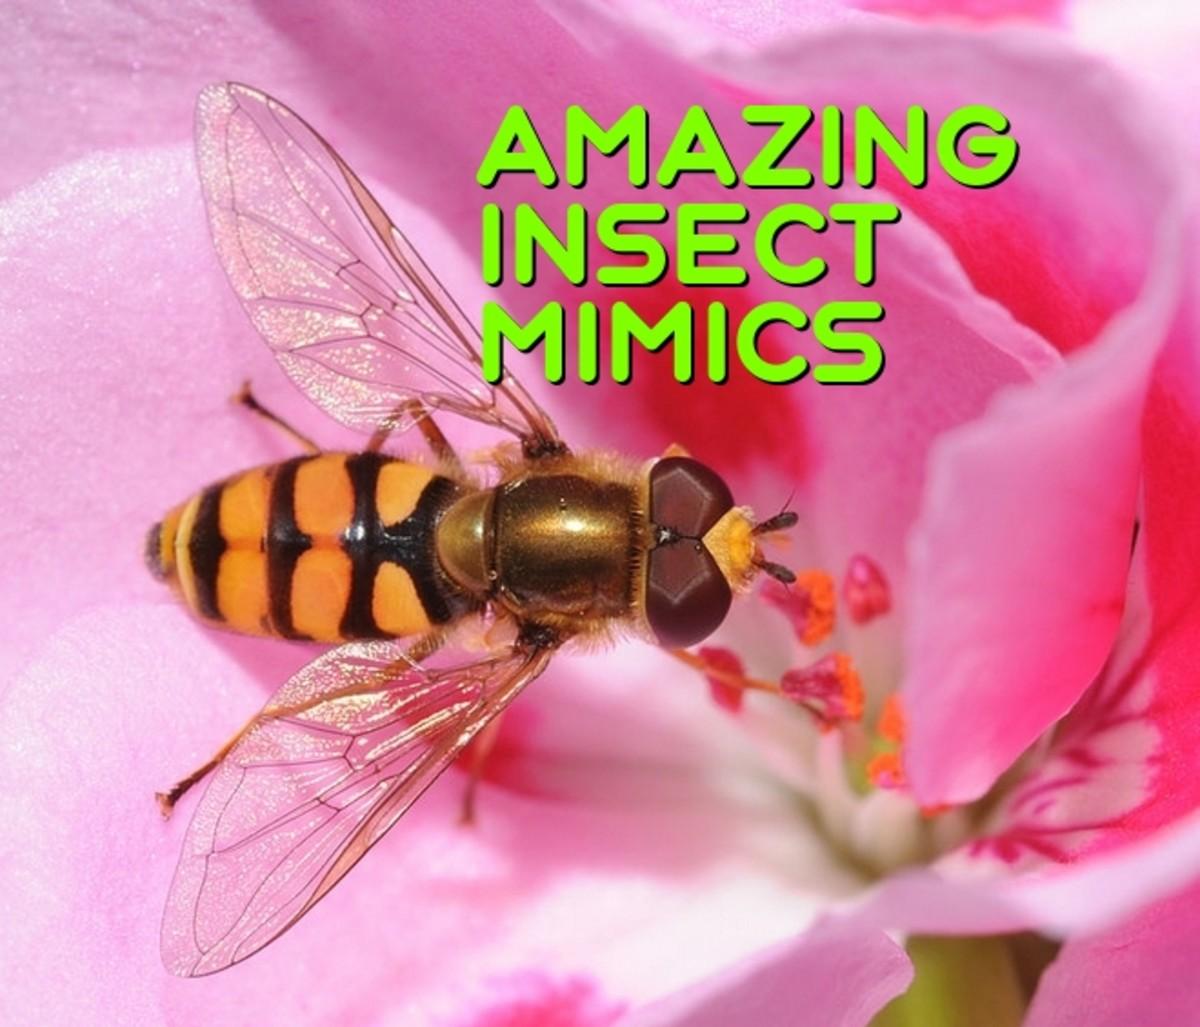 Amazing Insect Mimics